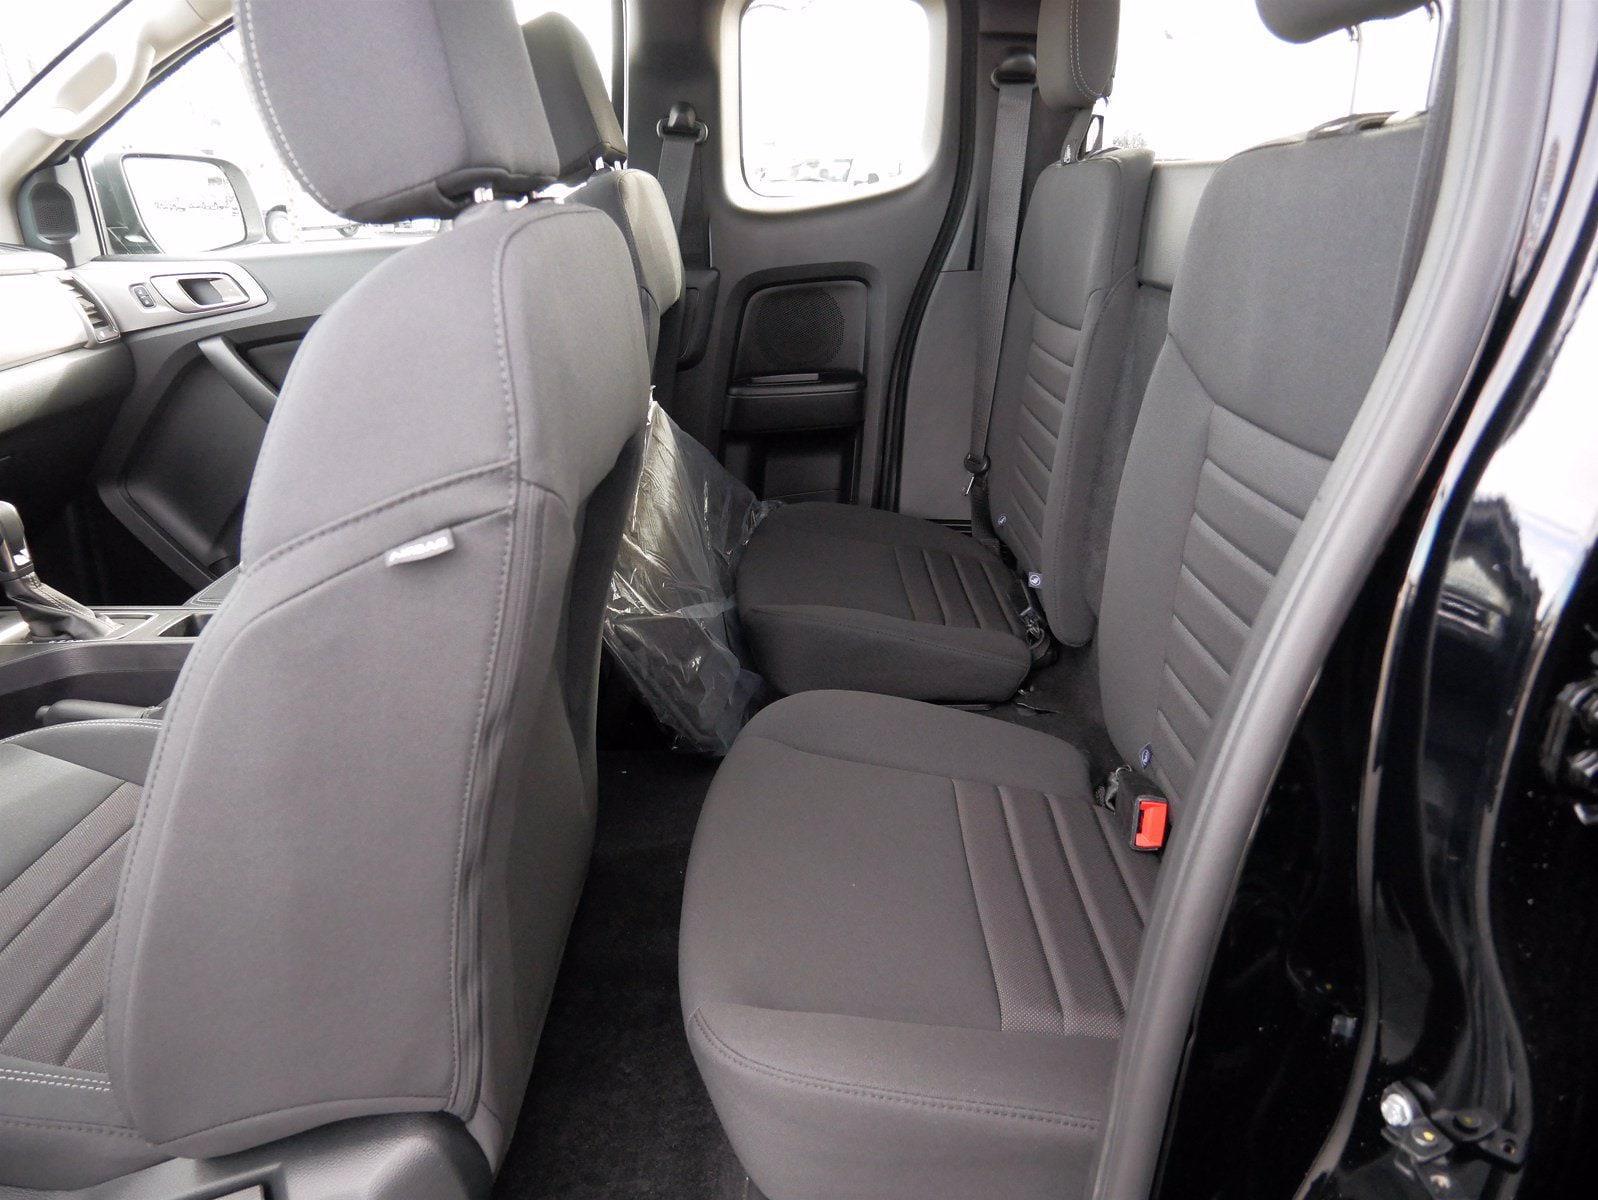 2021 Ford Ranger Super Cab 4x4, Pickup #22762 - photo 20